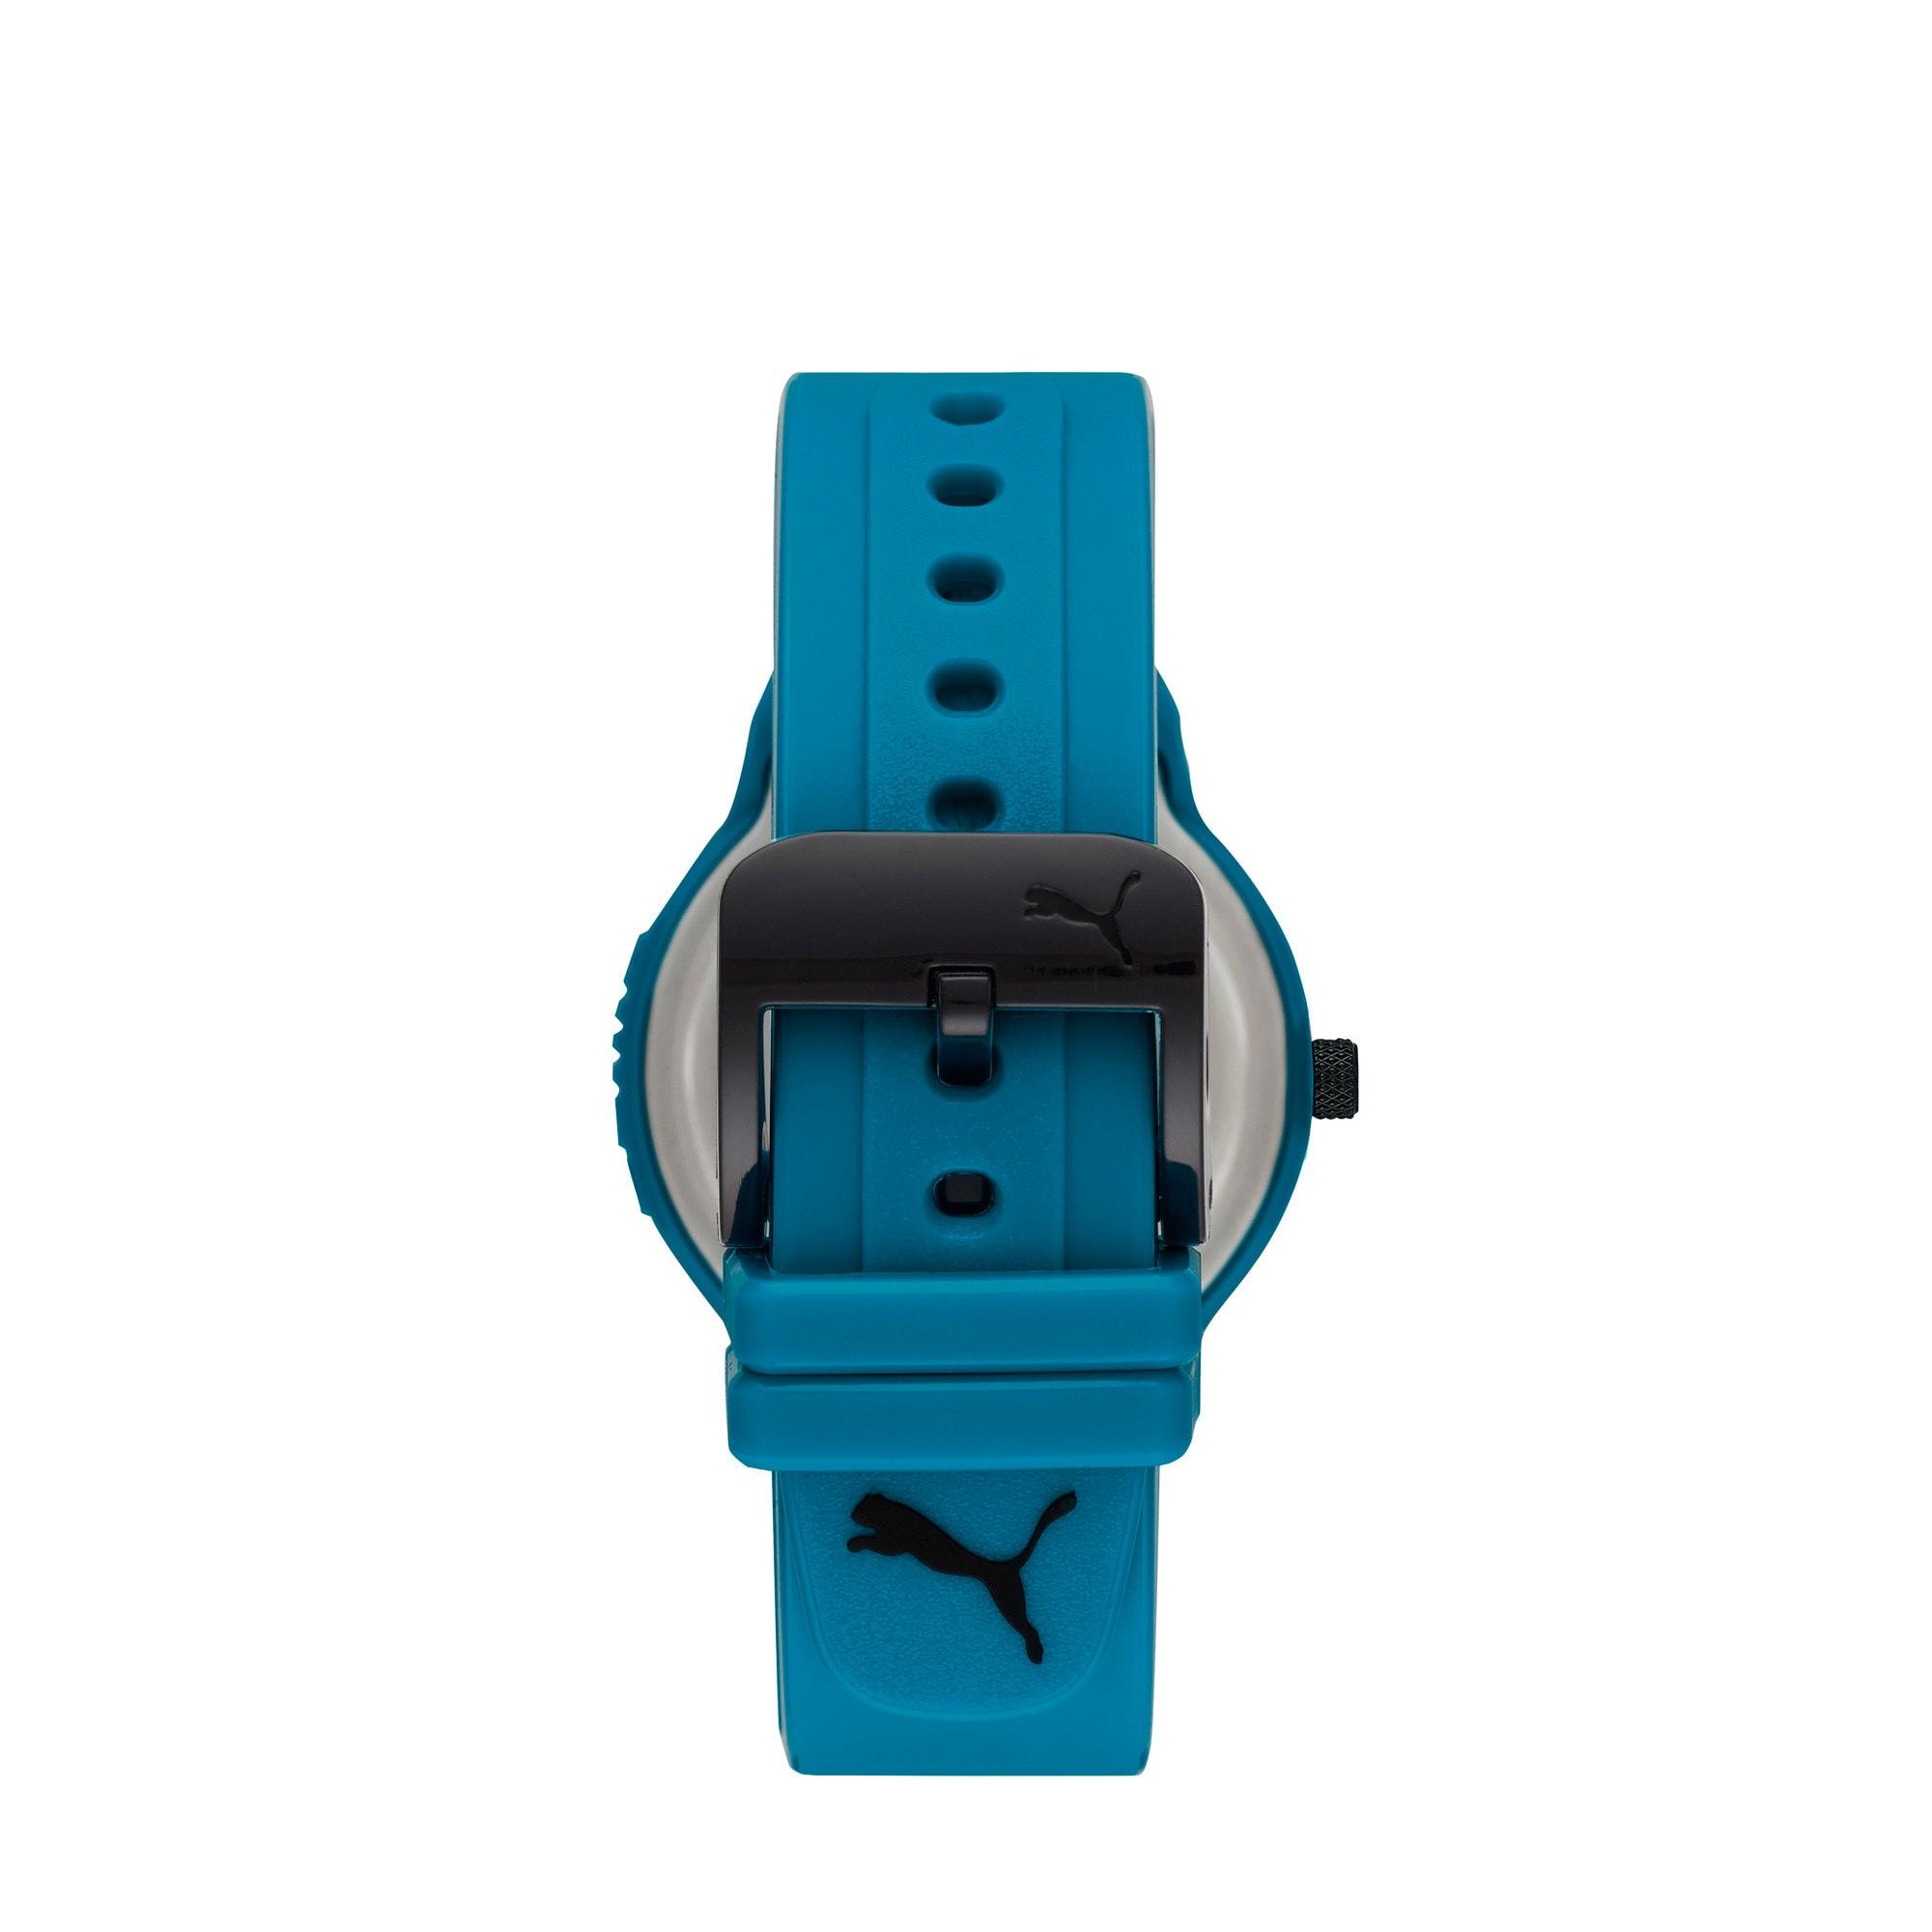 Thumbnail 2 of Reset v2 Watch, Blue/Blue, medium